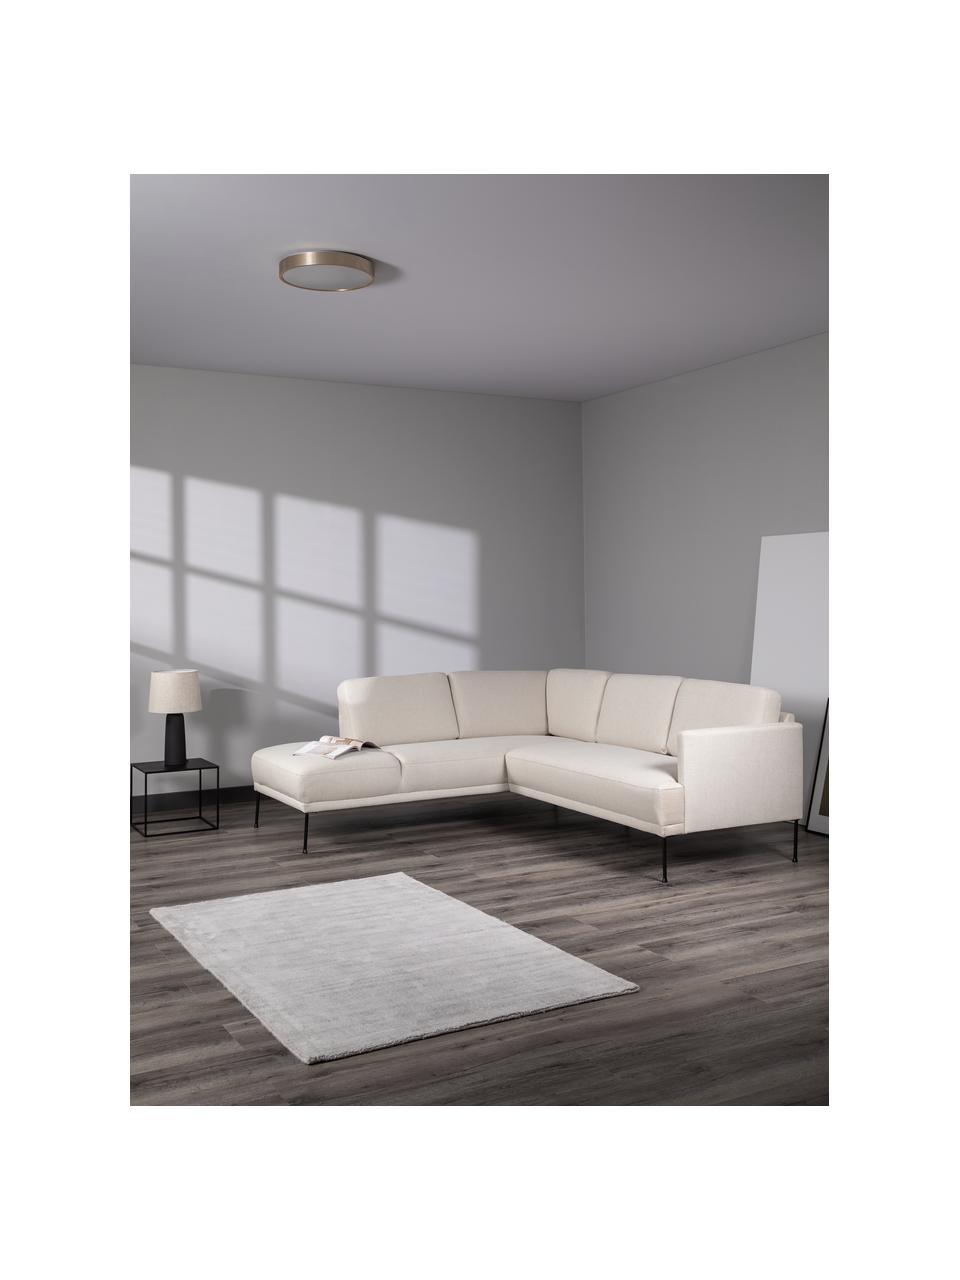 Canapé d'angle tissu beige pieds en métal Fluente, Tissu beige